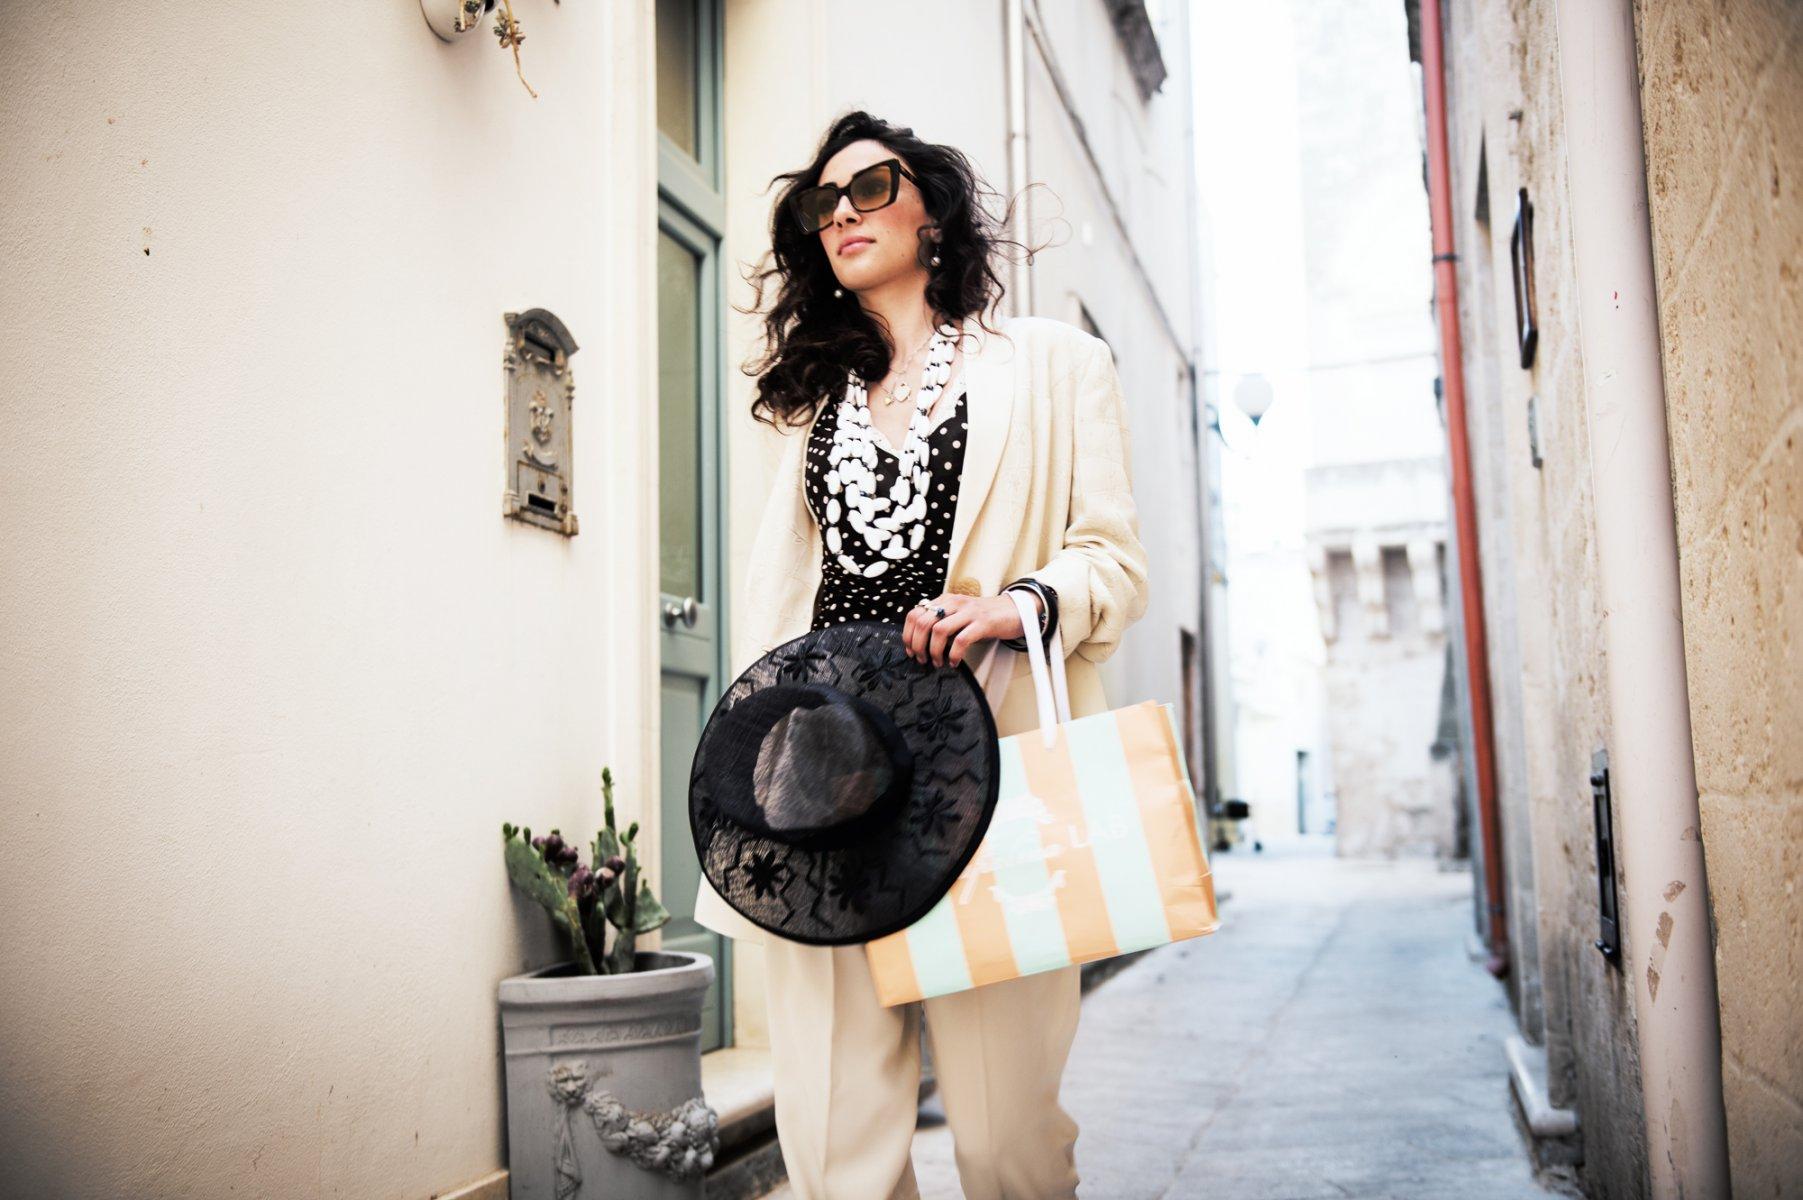 167-Pretty_Woman_MMD9447 Fashion/Adv